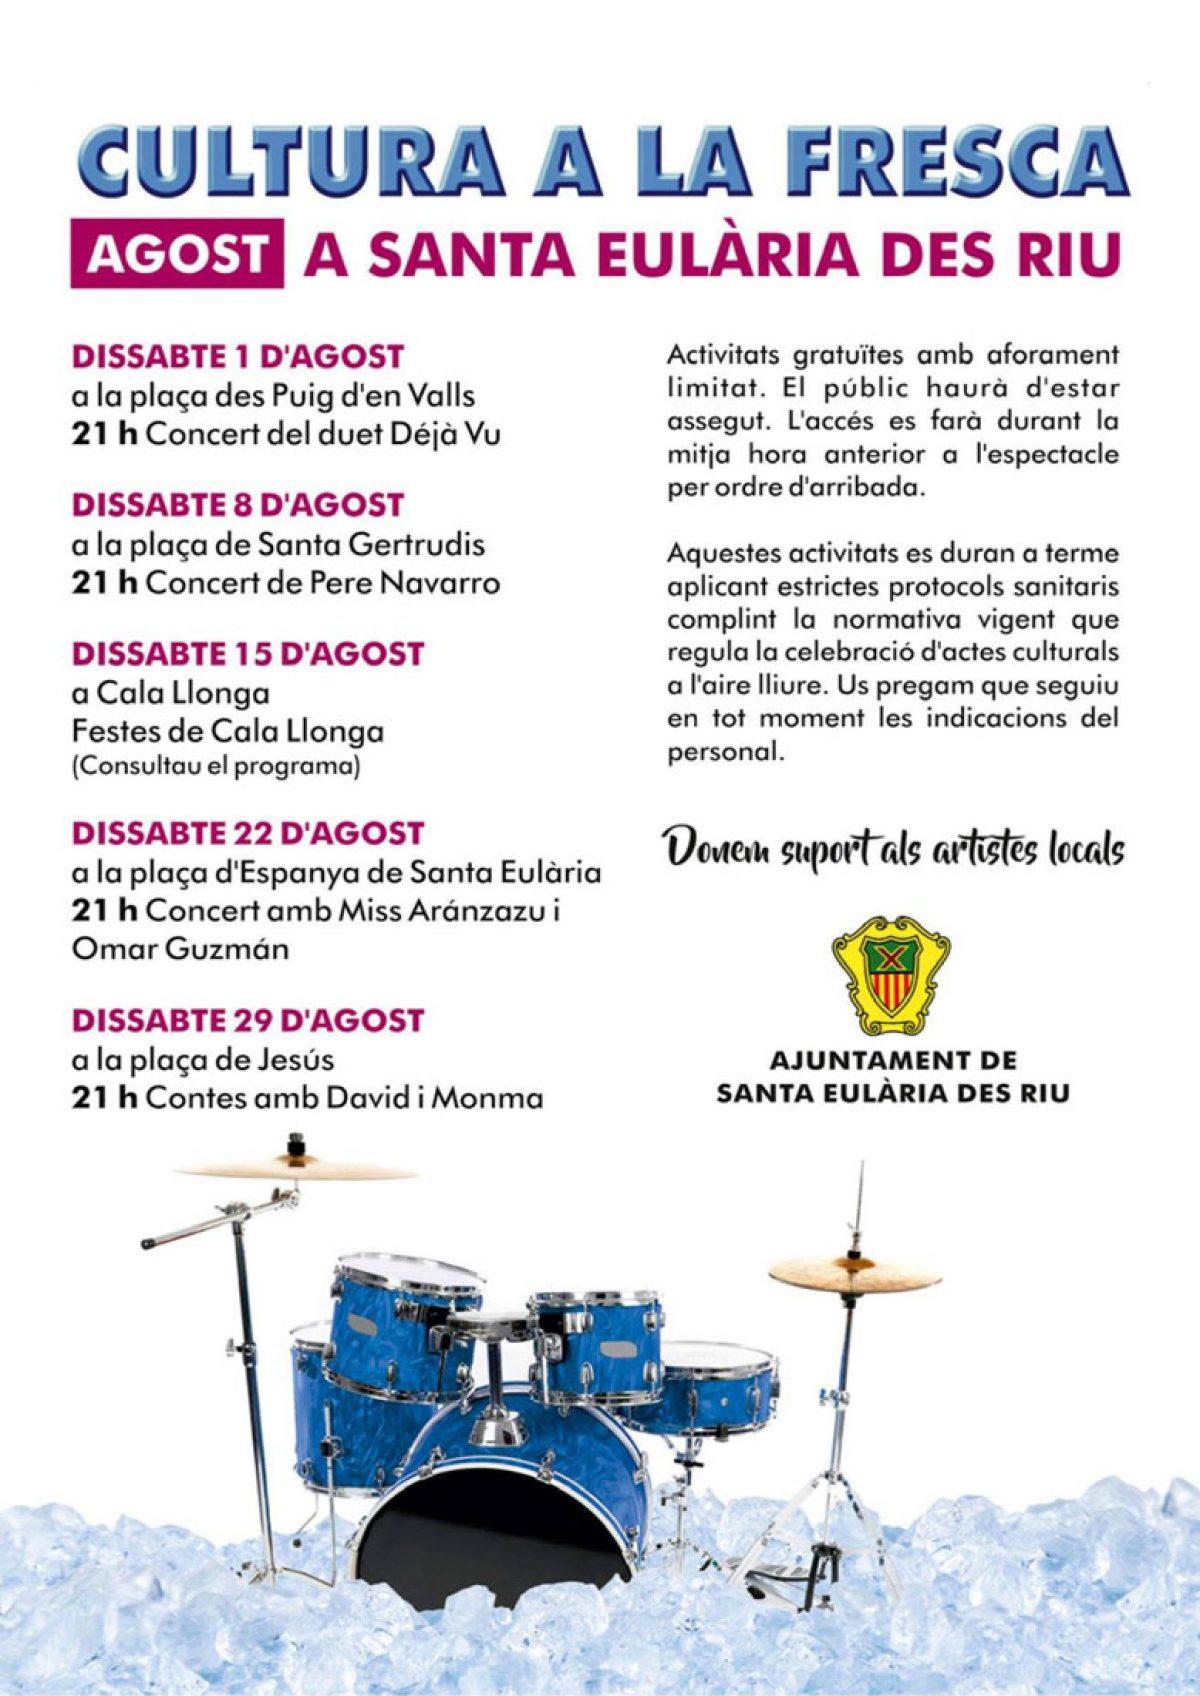 culture-a-la-fresco-august-santa-eulalia-ibiza-2020-welcometoibiza